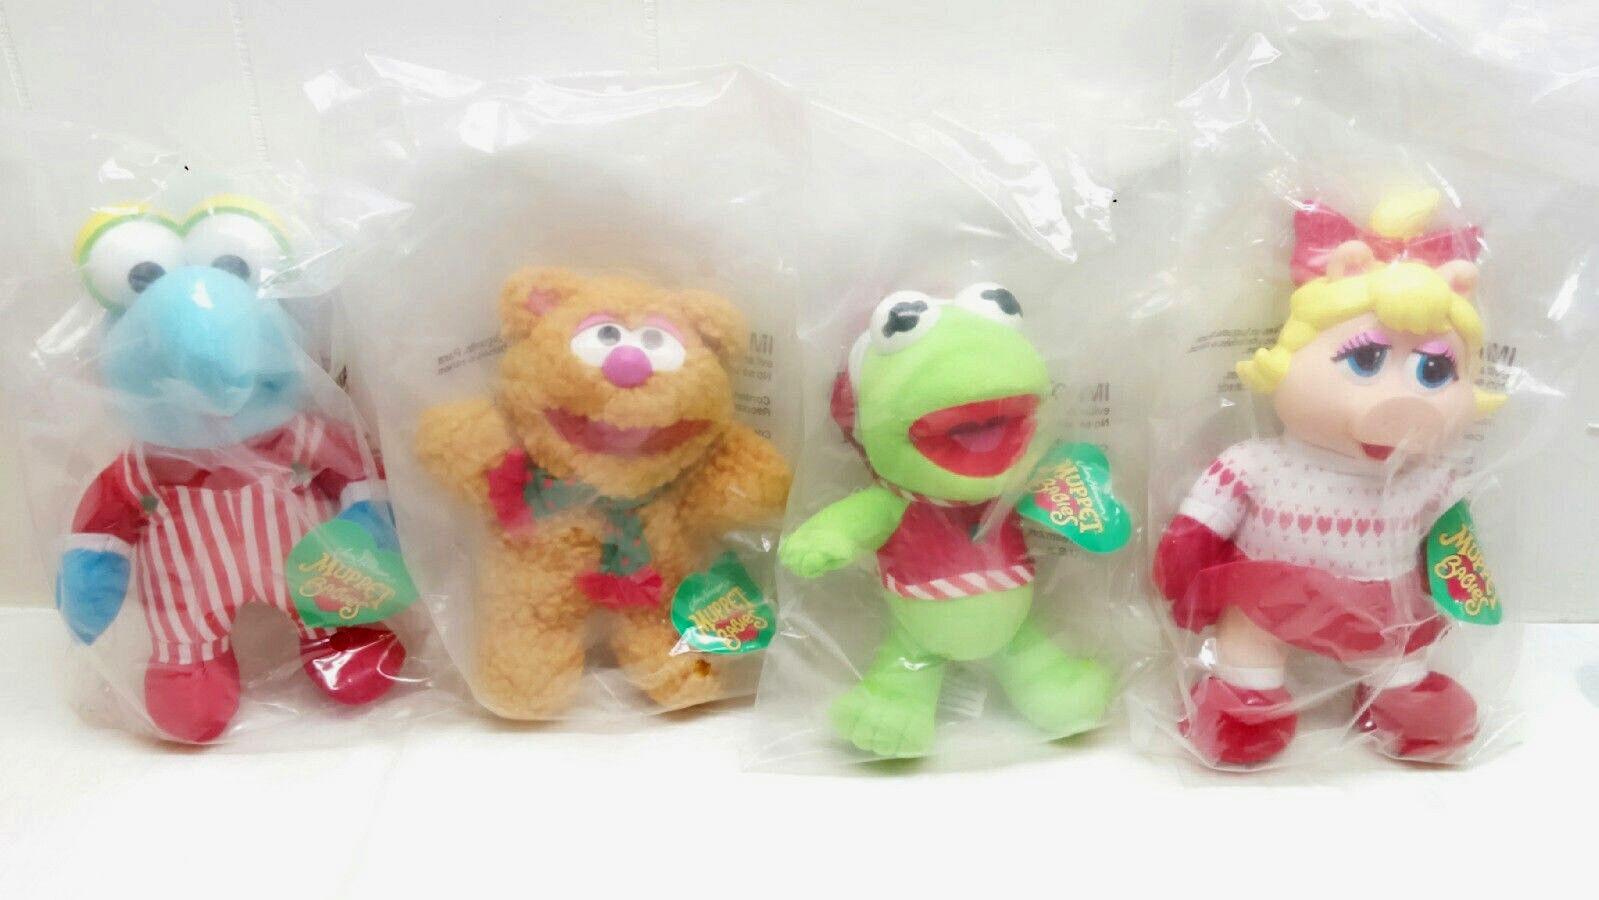 McDonald's - Jim Henson's The Muppets -1994 - New Complete Set, RARE Plush Dolls